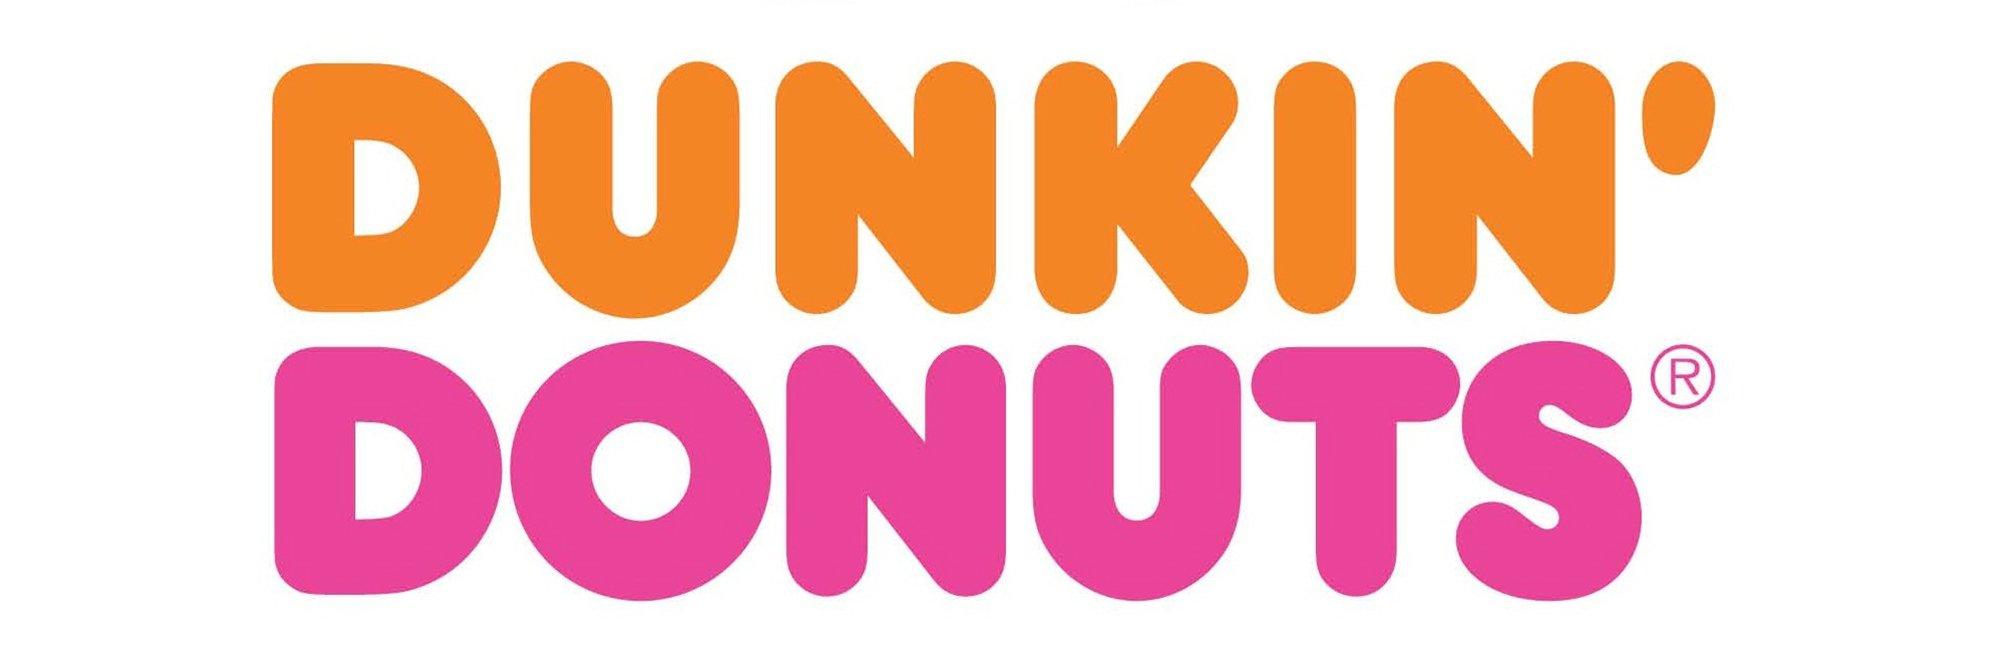 Dunkin Donuts Logo, Dunkin Donuts Symbol, Meaning, History ...